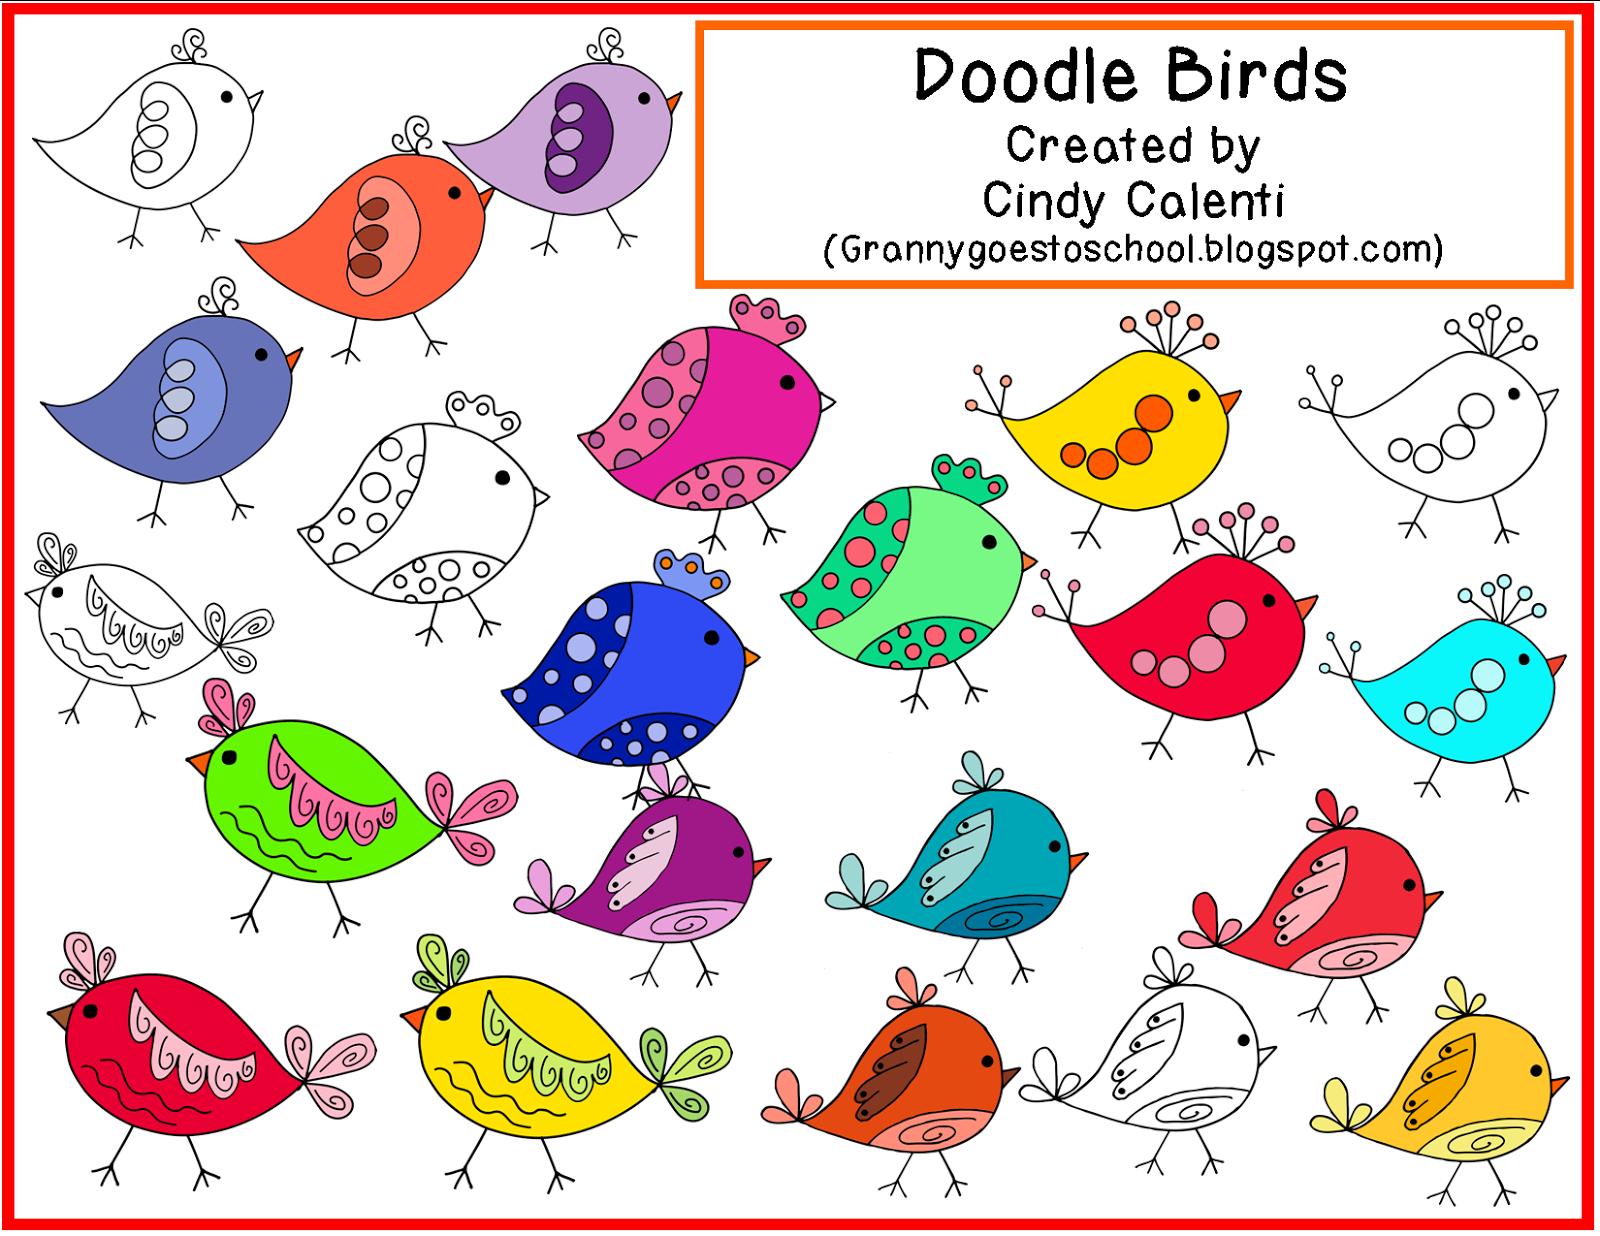 http://grannygoestoschool.blogspot.com/2014/08/doodle-birds-clip-art-freebie.html